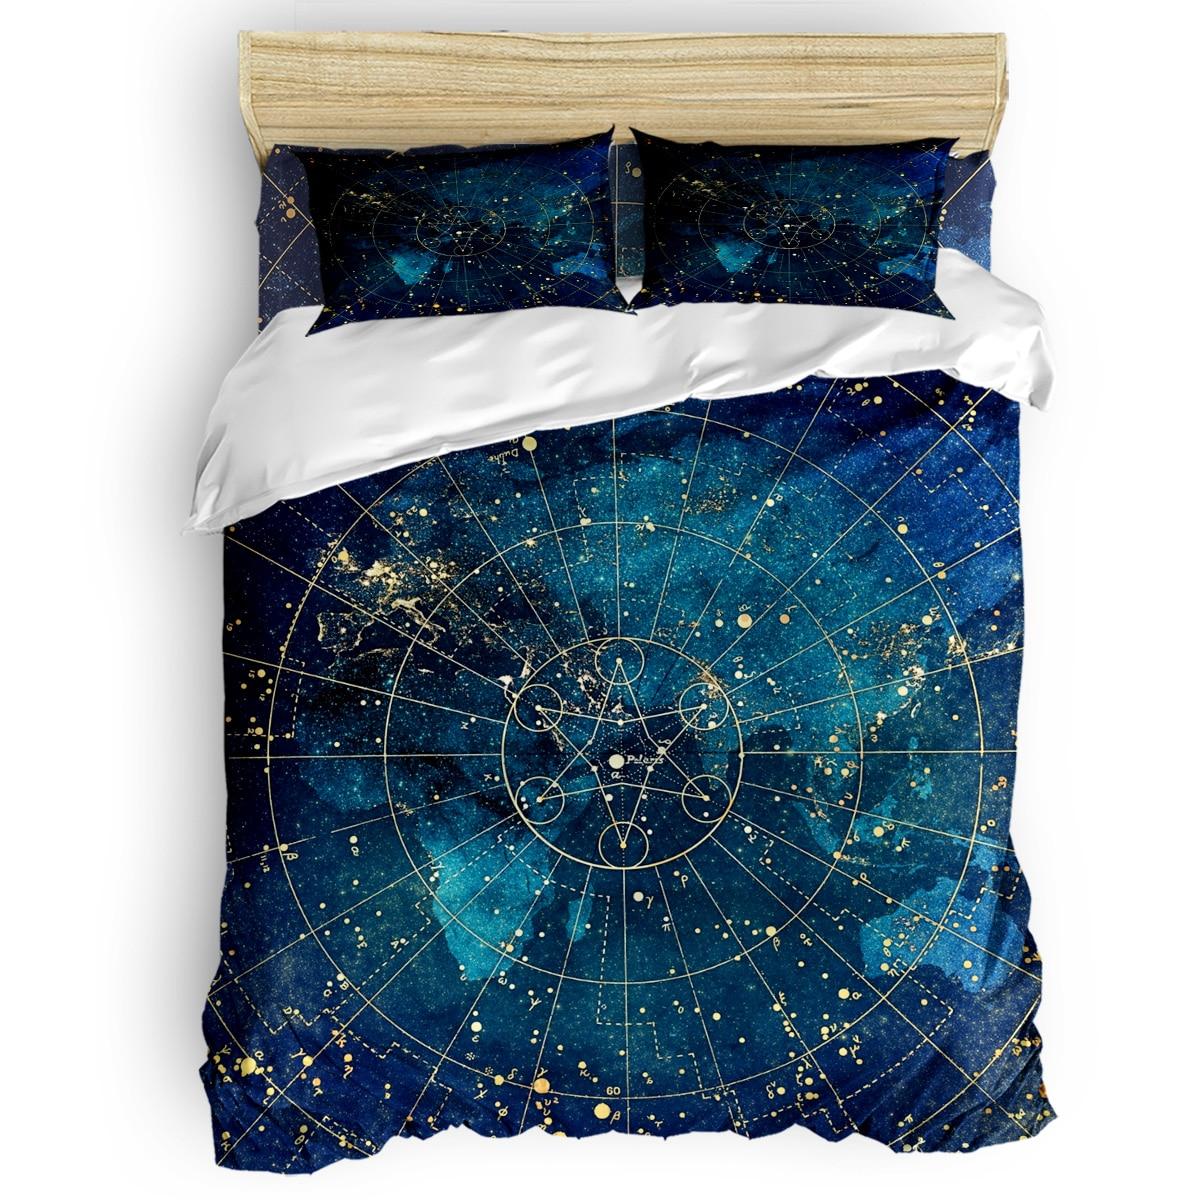 Star Map City Lights Duvet Cover 3D Cotton King Size Queen Size Quilt Cover Set Bedclothes Comforter Single Bedding Sets